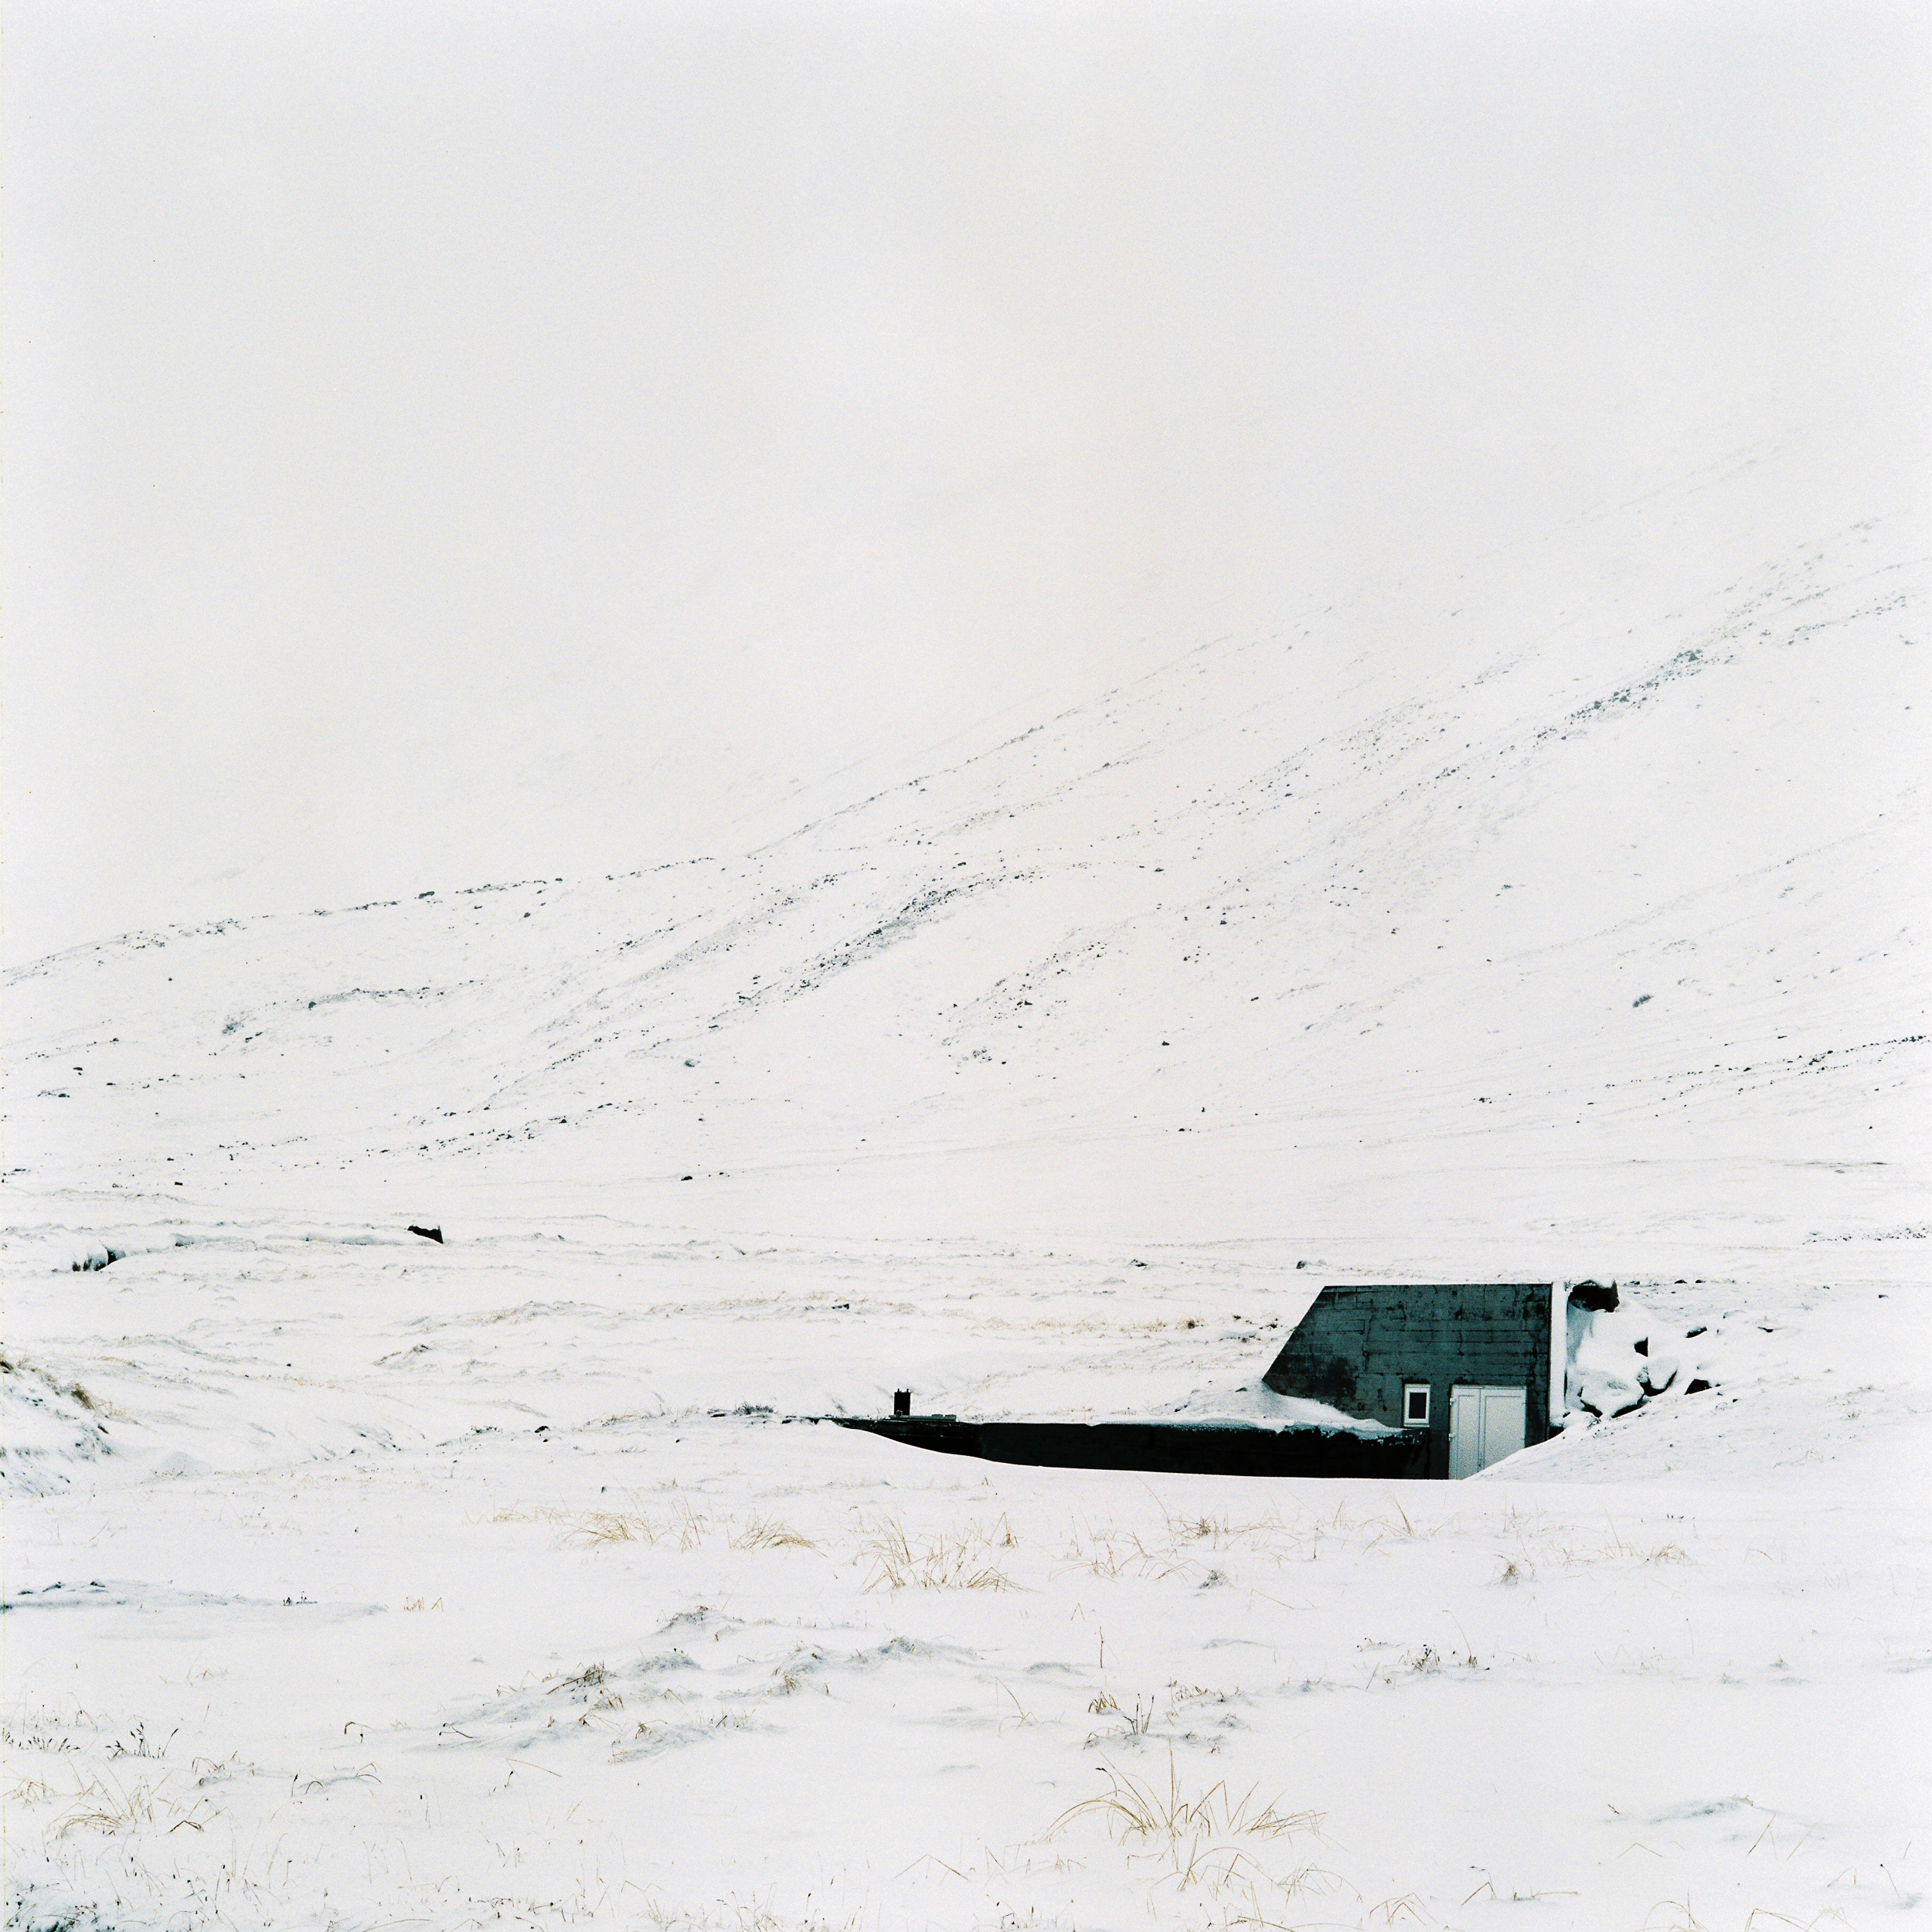 Iceland-Snow-5.jpg